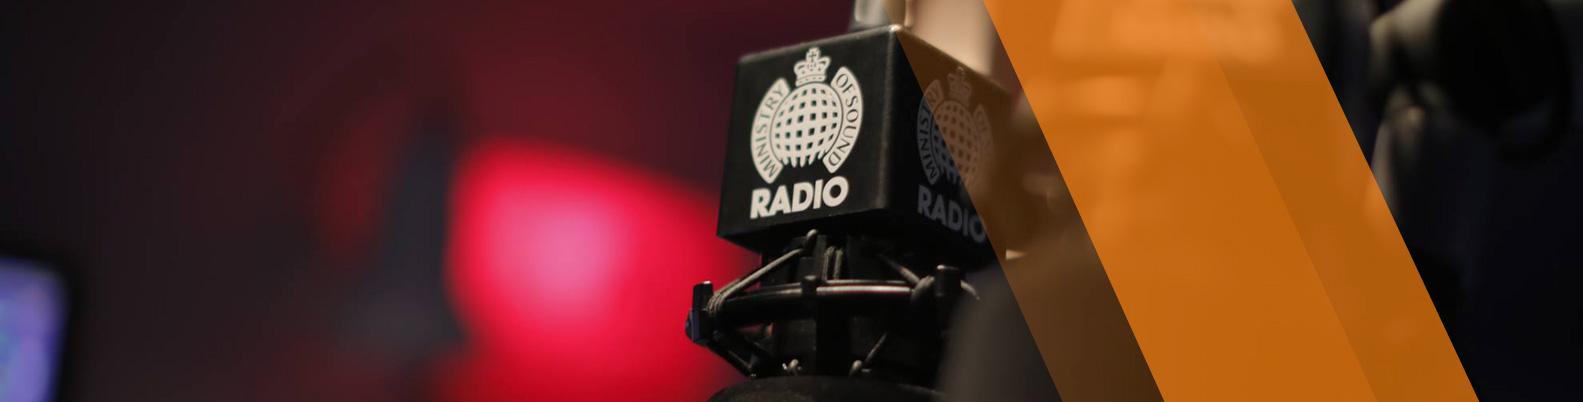 MINISTRY OF SOUND RADIO